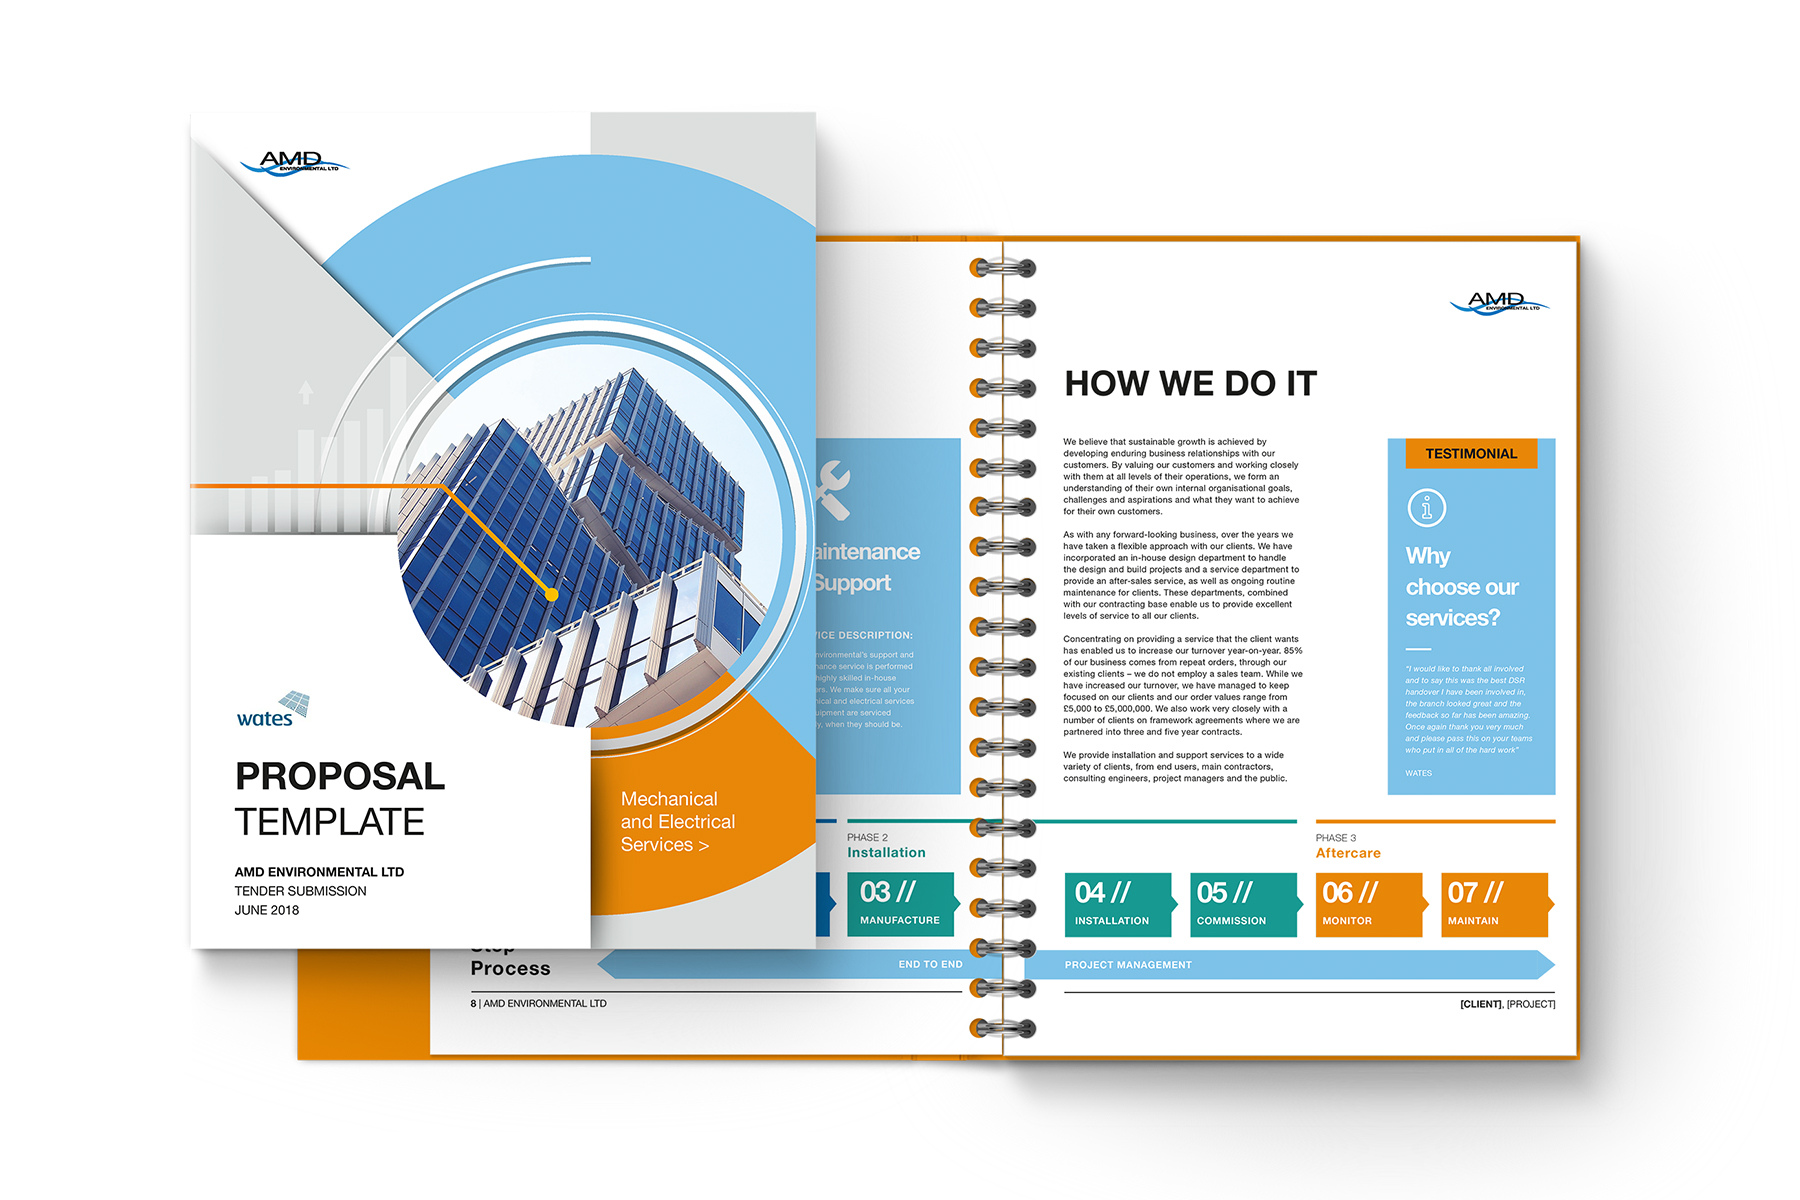 Proposal templates